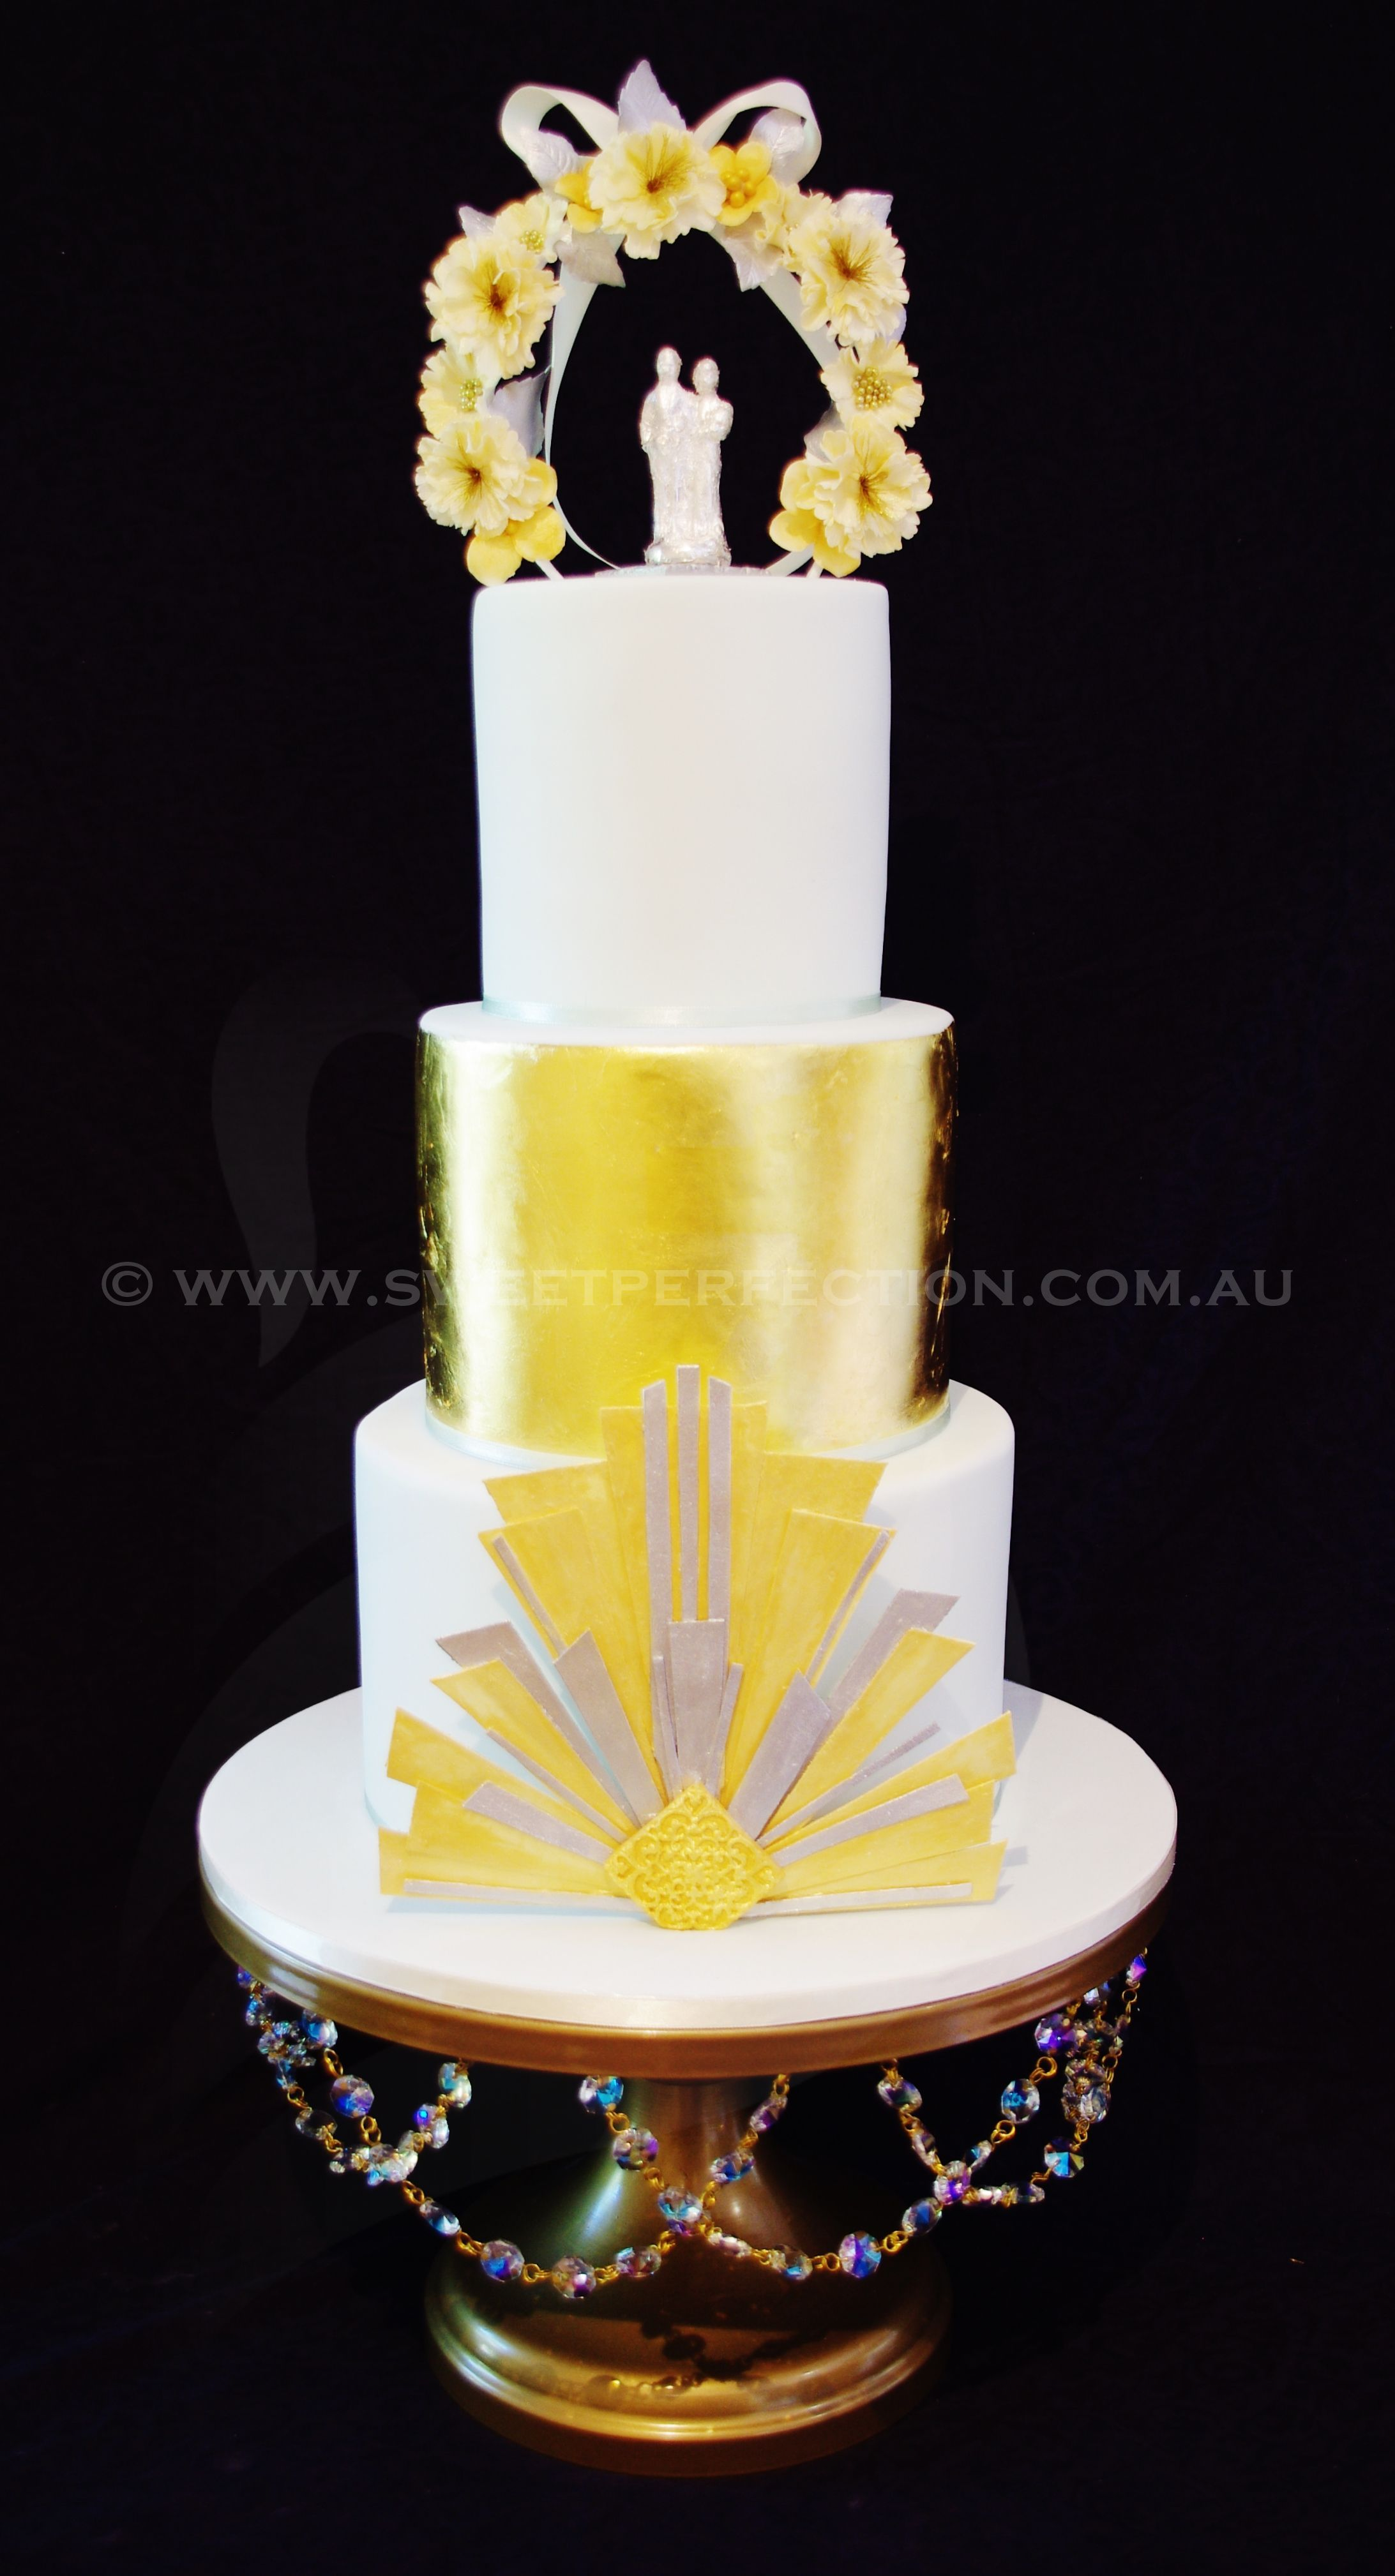 Brilliant Art Deco wedding cake design, with 24K gold leaf, mint ...